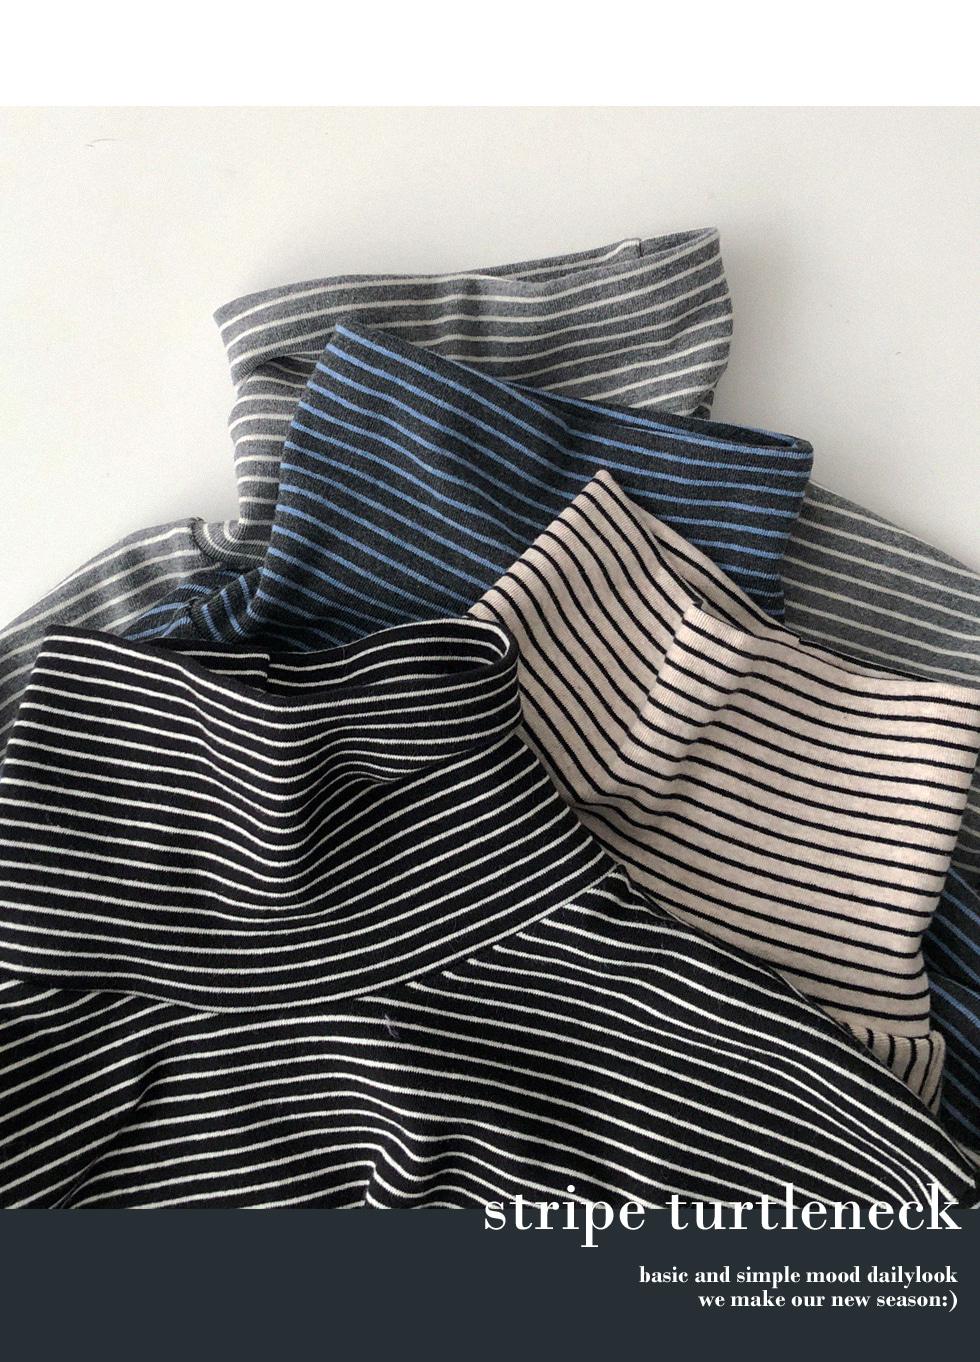 Cheljan Striped pitch Turtleneck T-shirt